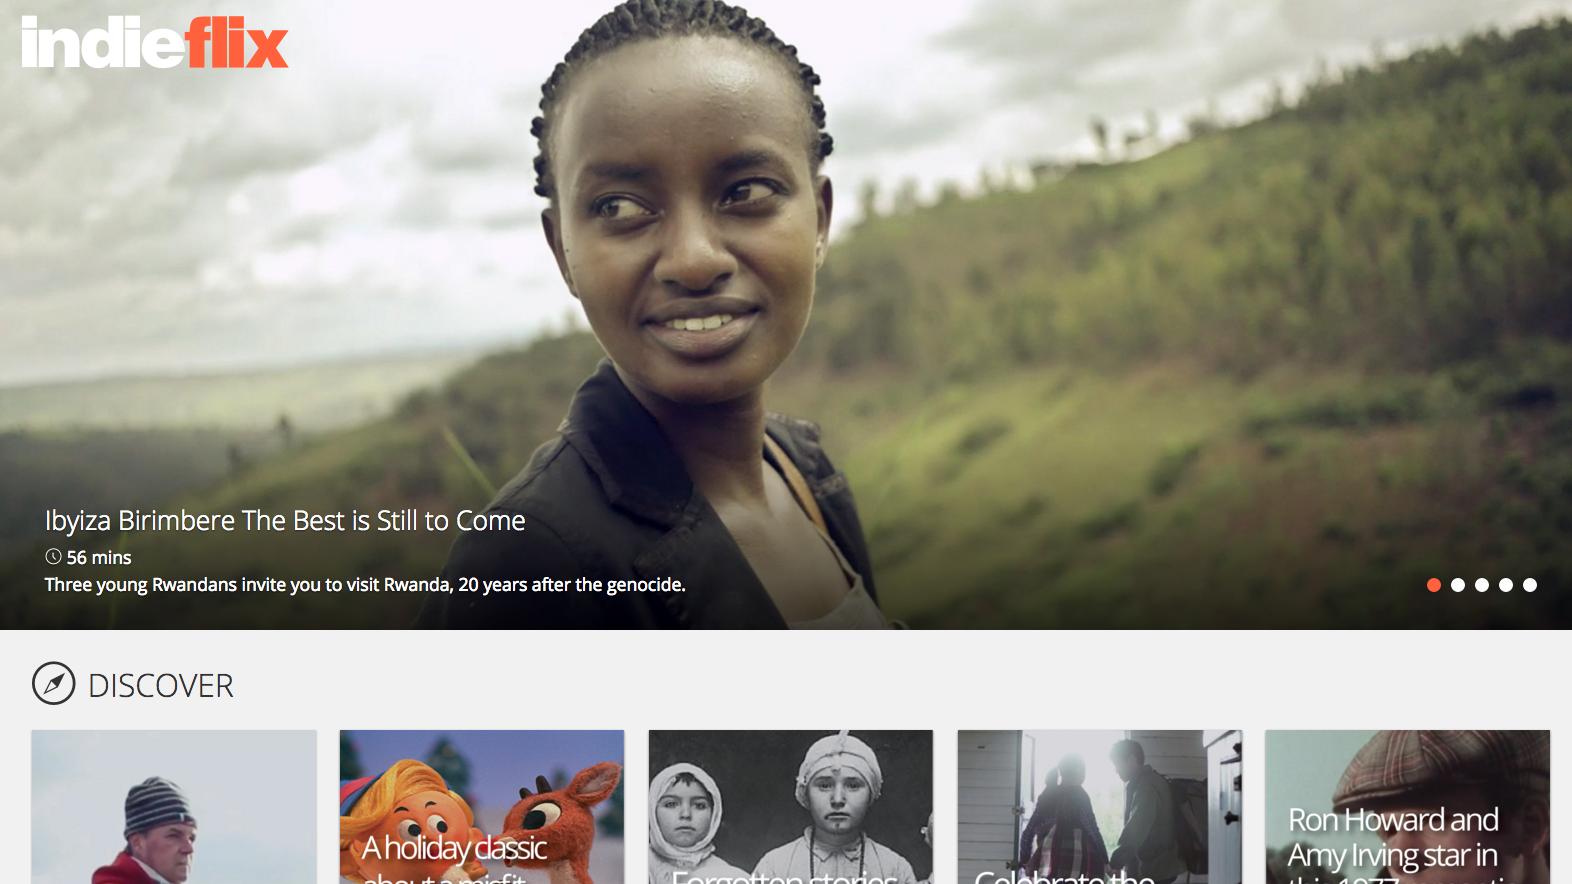 ibyiza-birimbere-rwanda-documentary-feature-indieflix